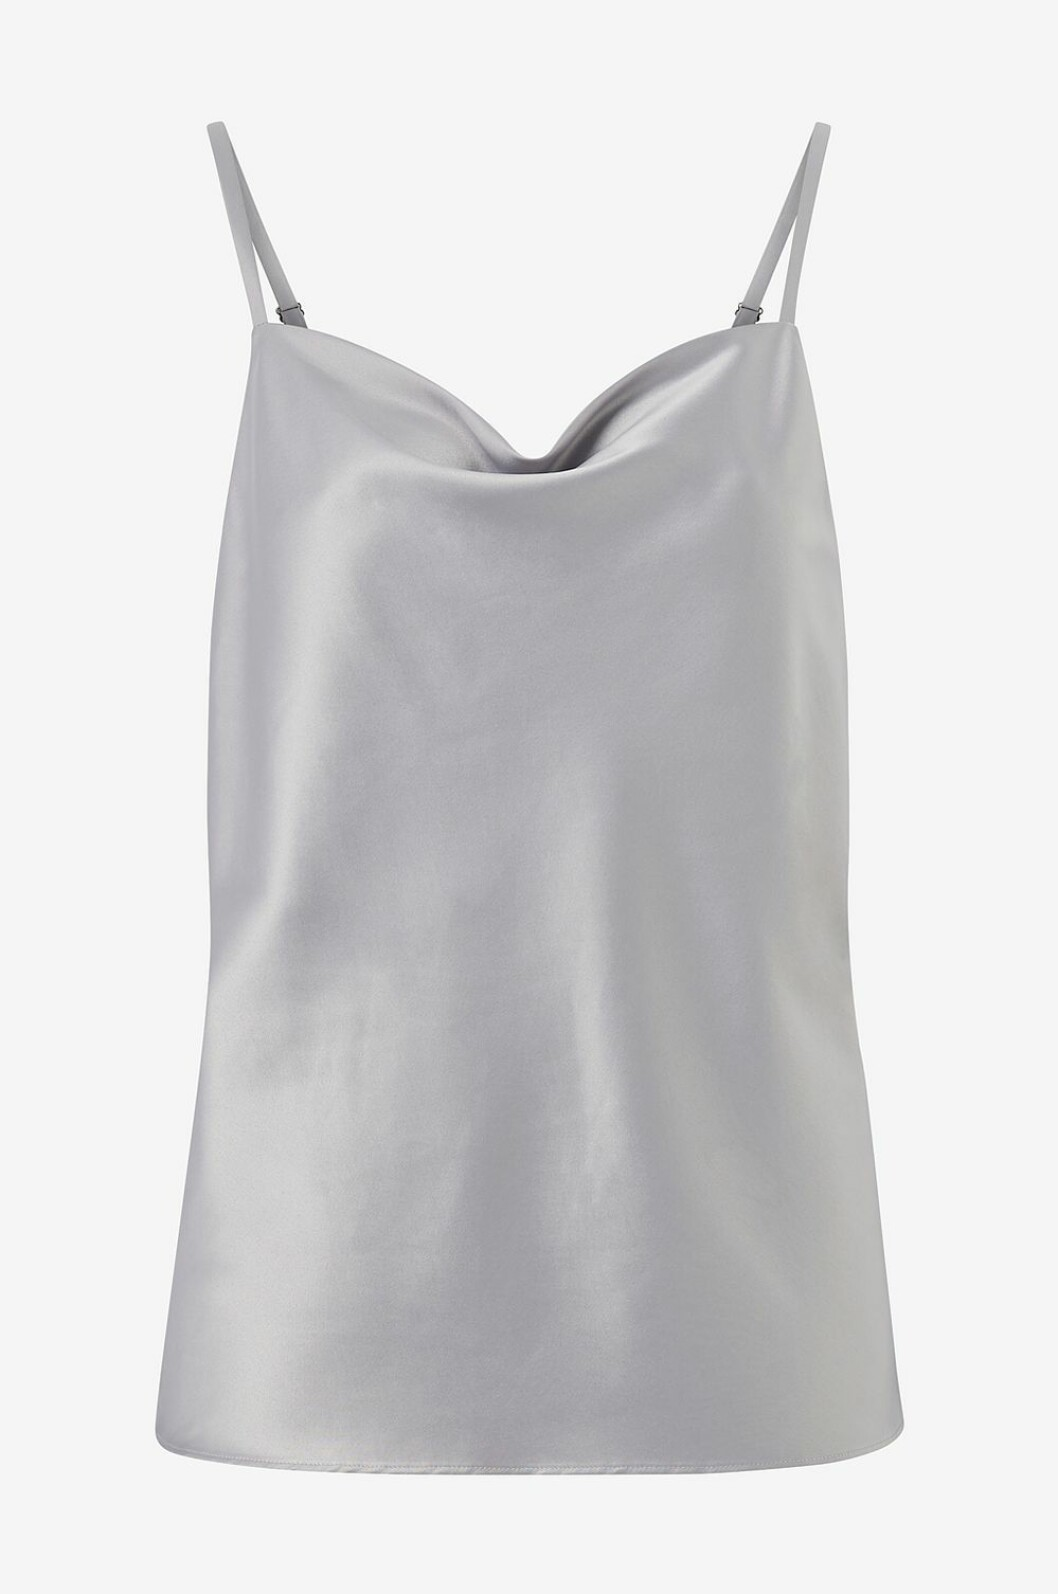 Matchande set: Silverfärgat linne